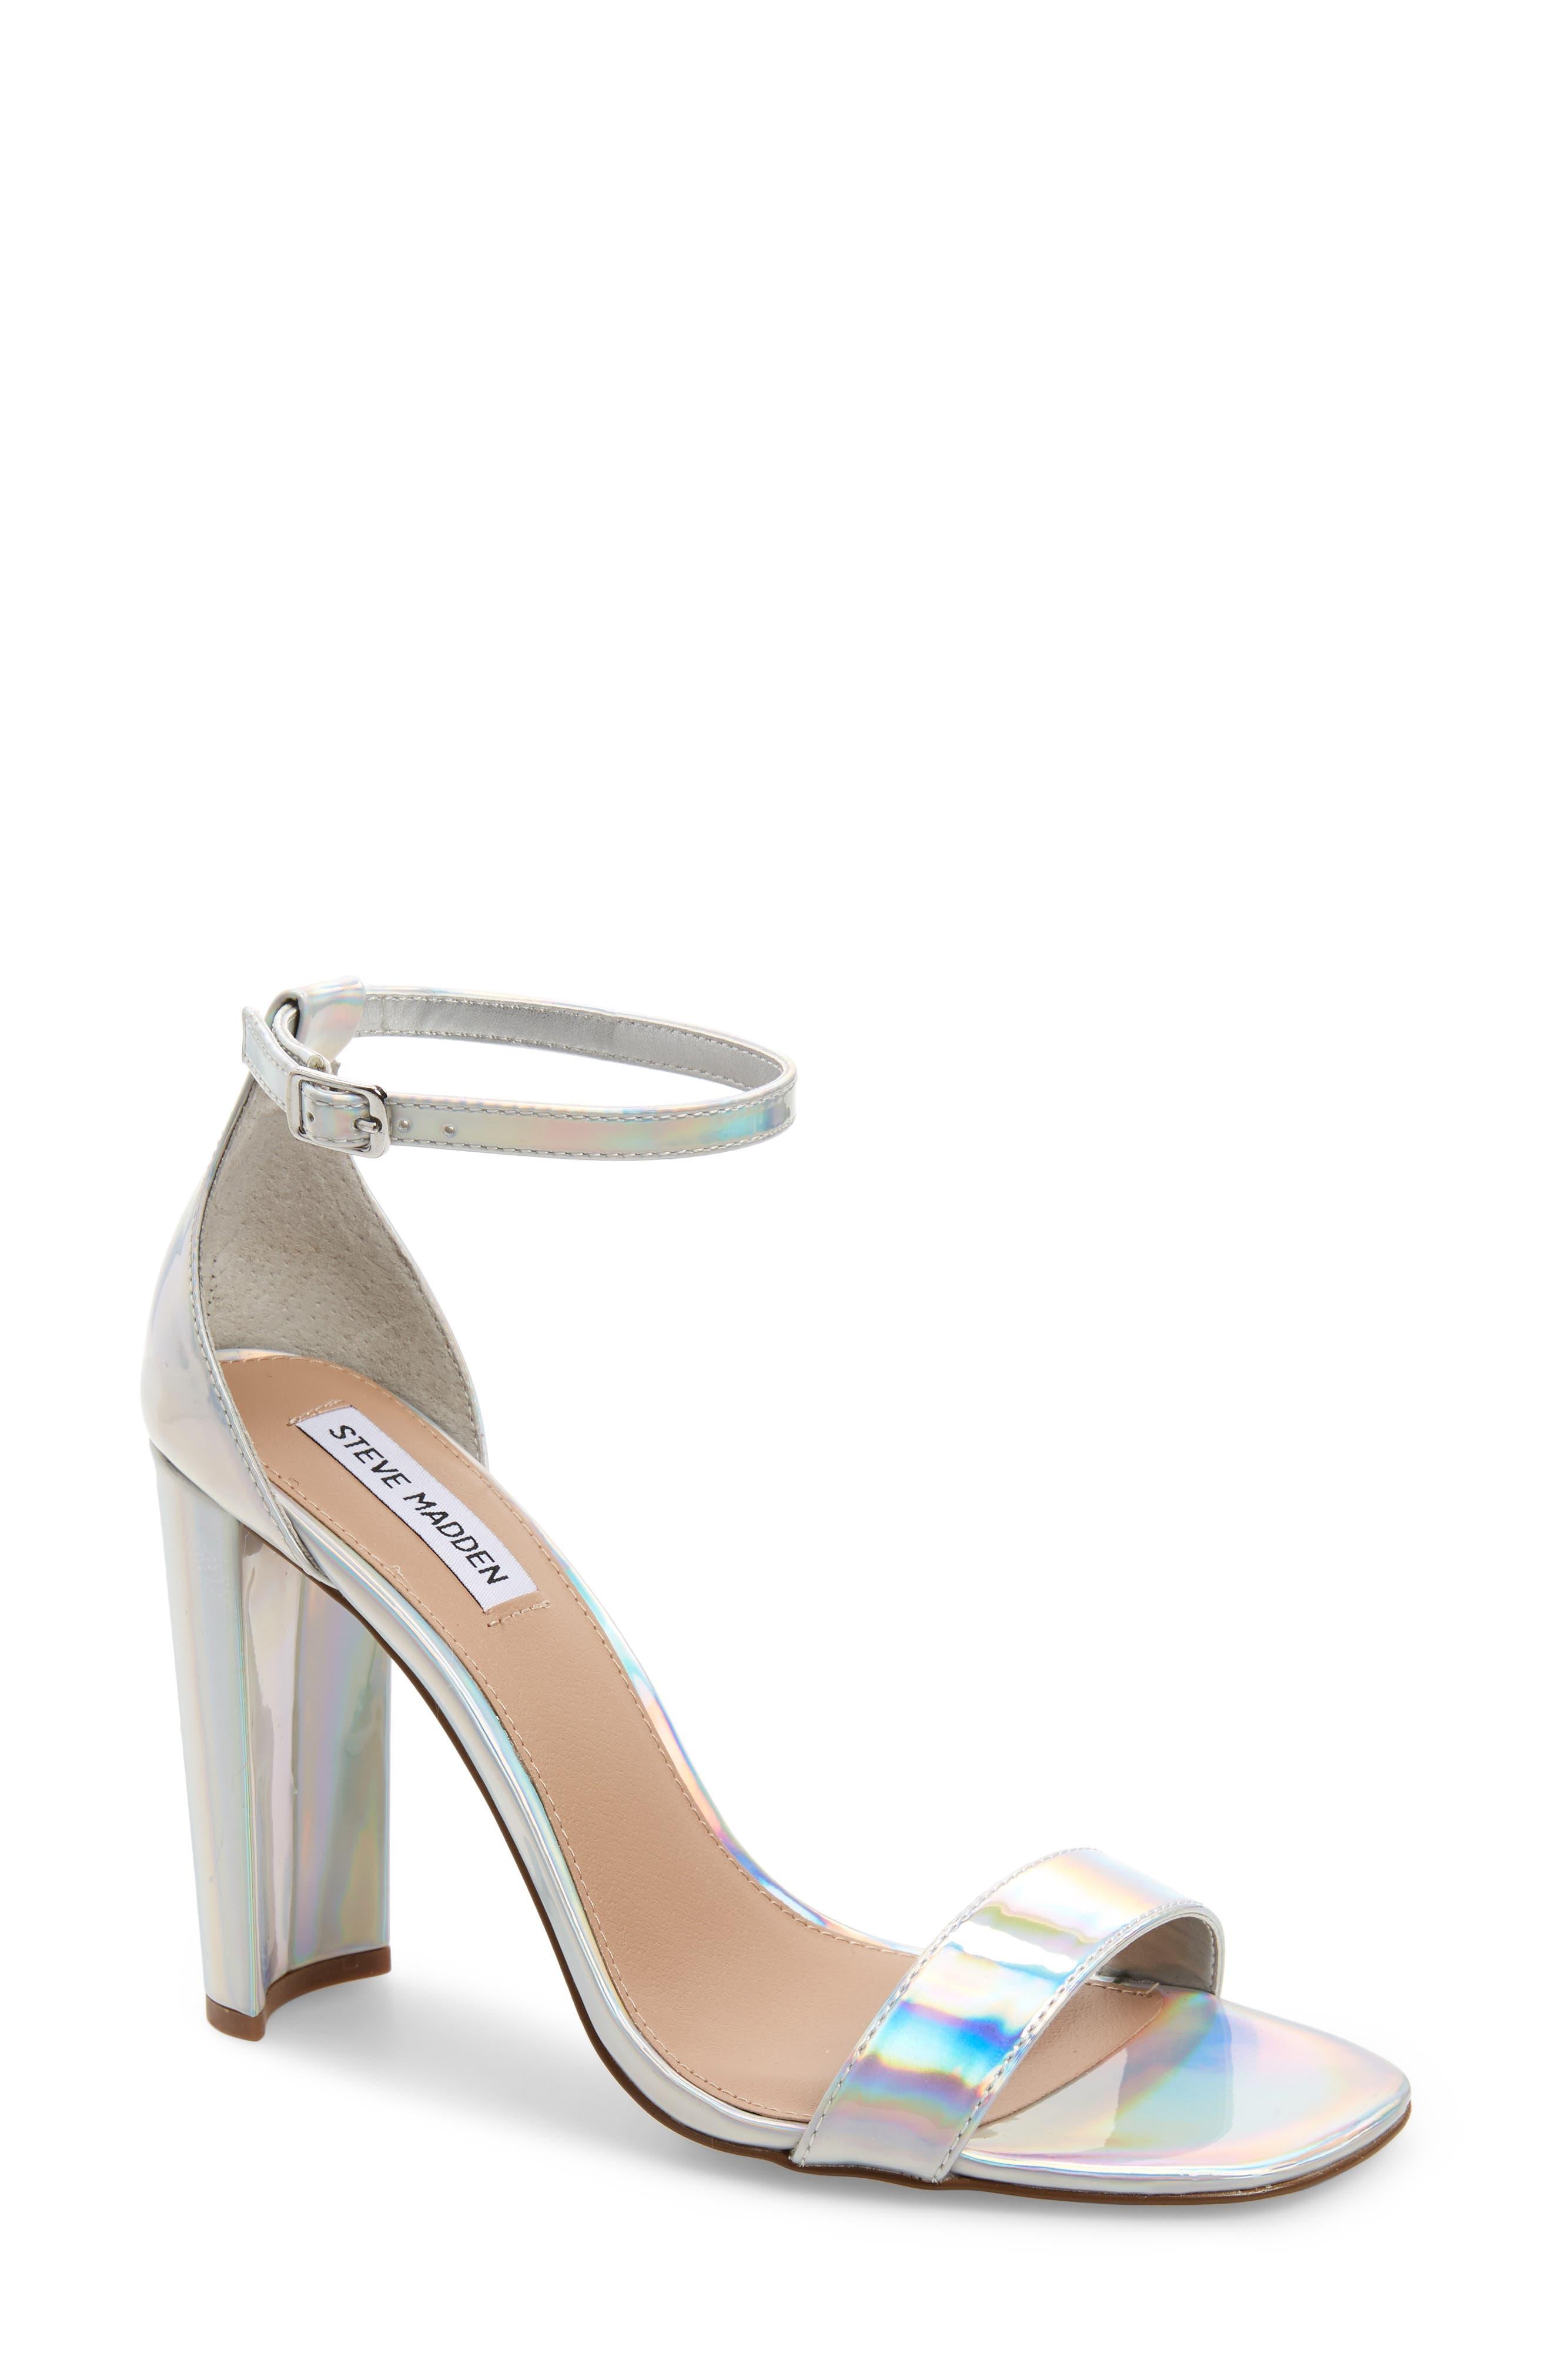 812541dd38e steve madden shoes sale